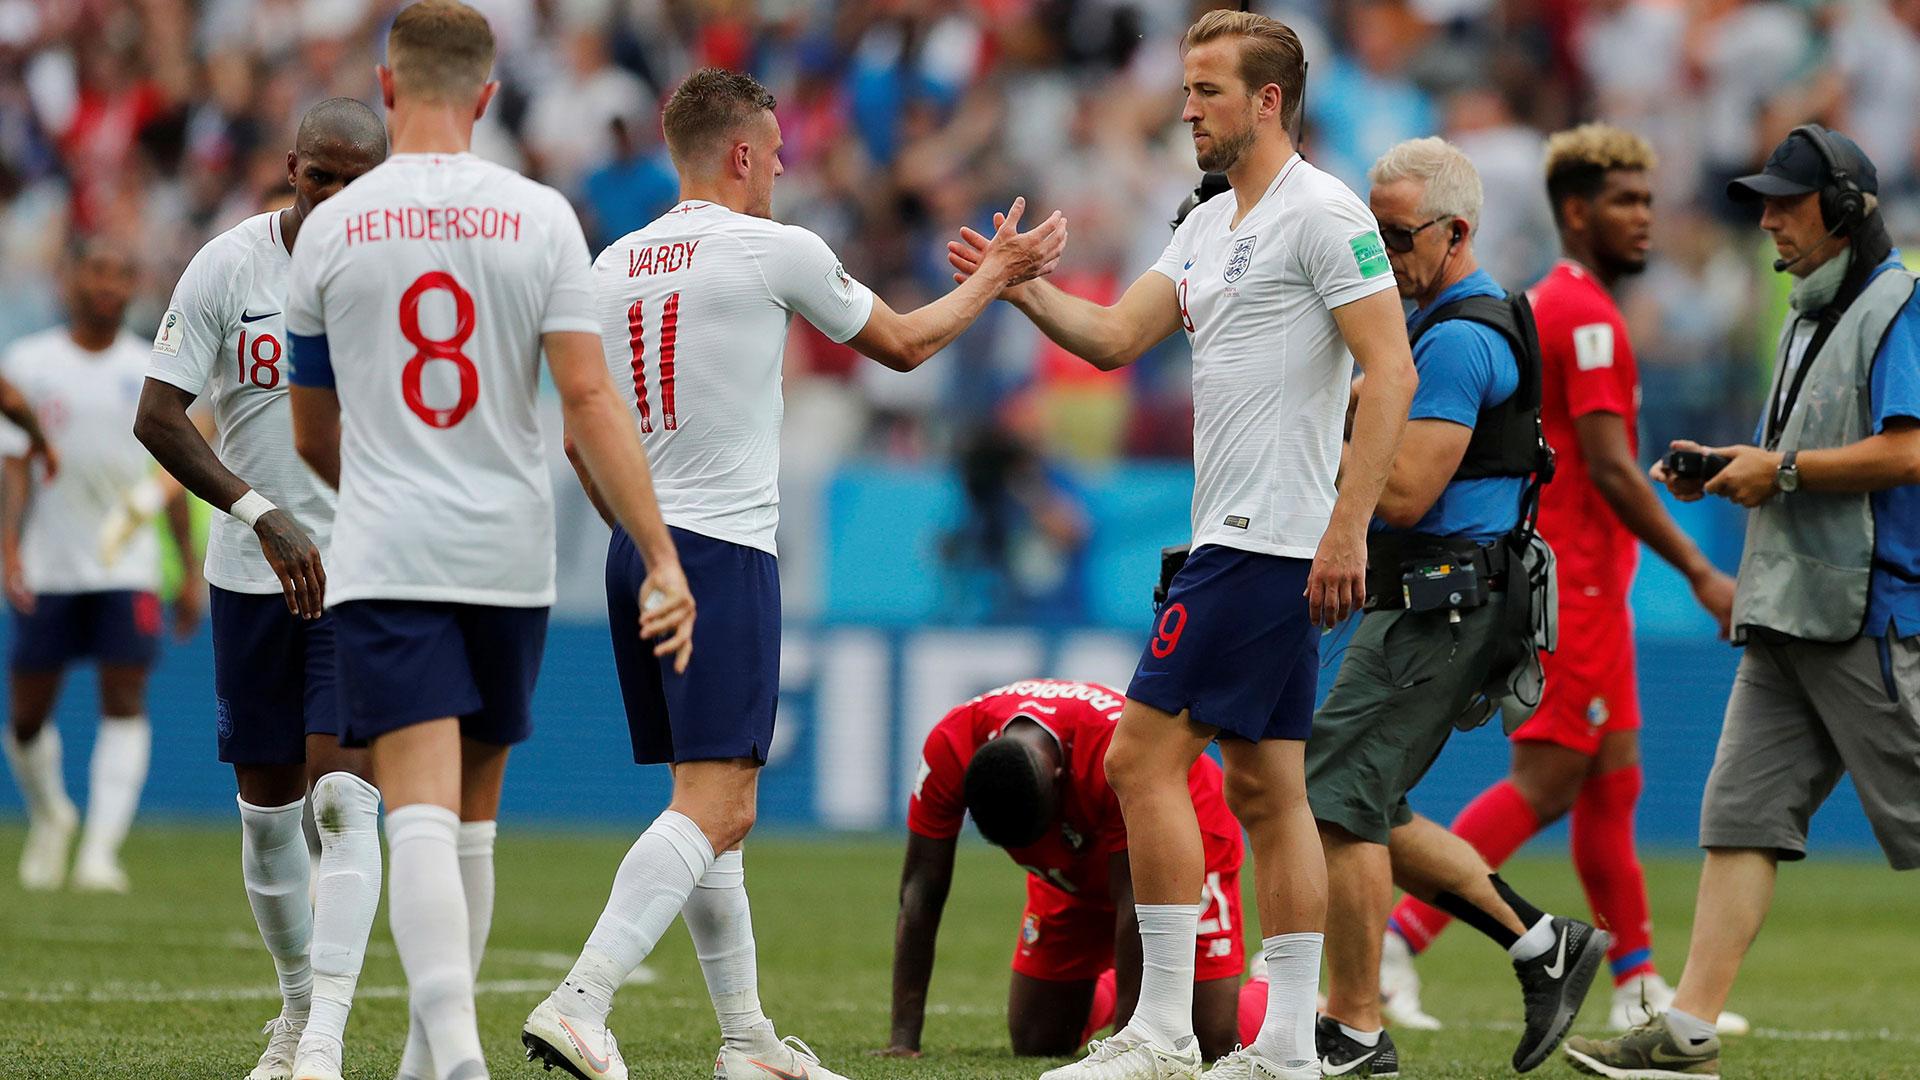 Inglaterra falla y deja a Bélgica como líder del grupo